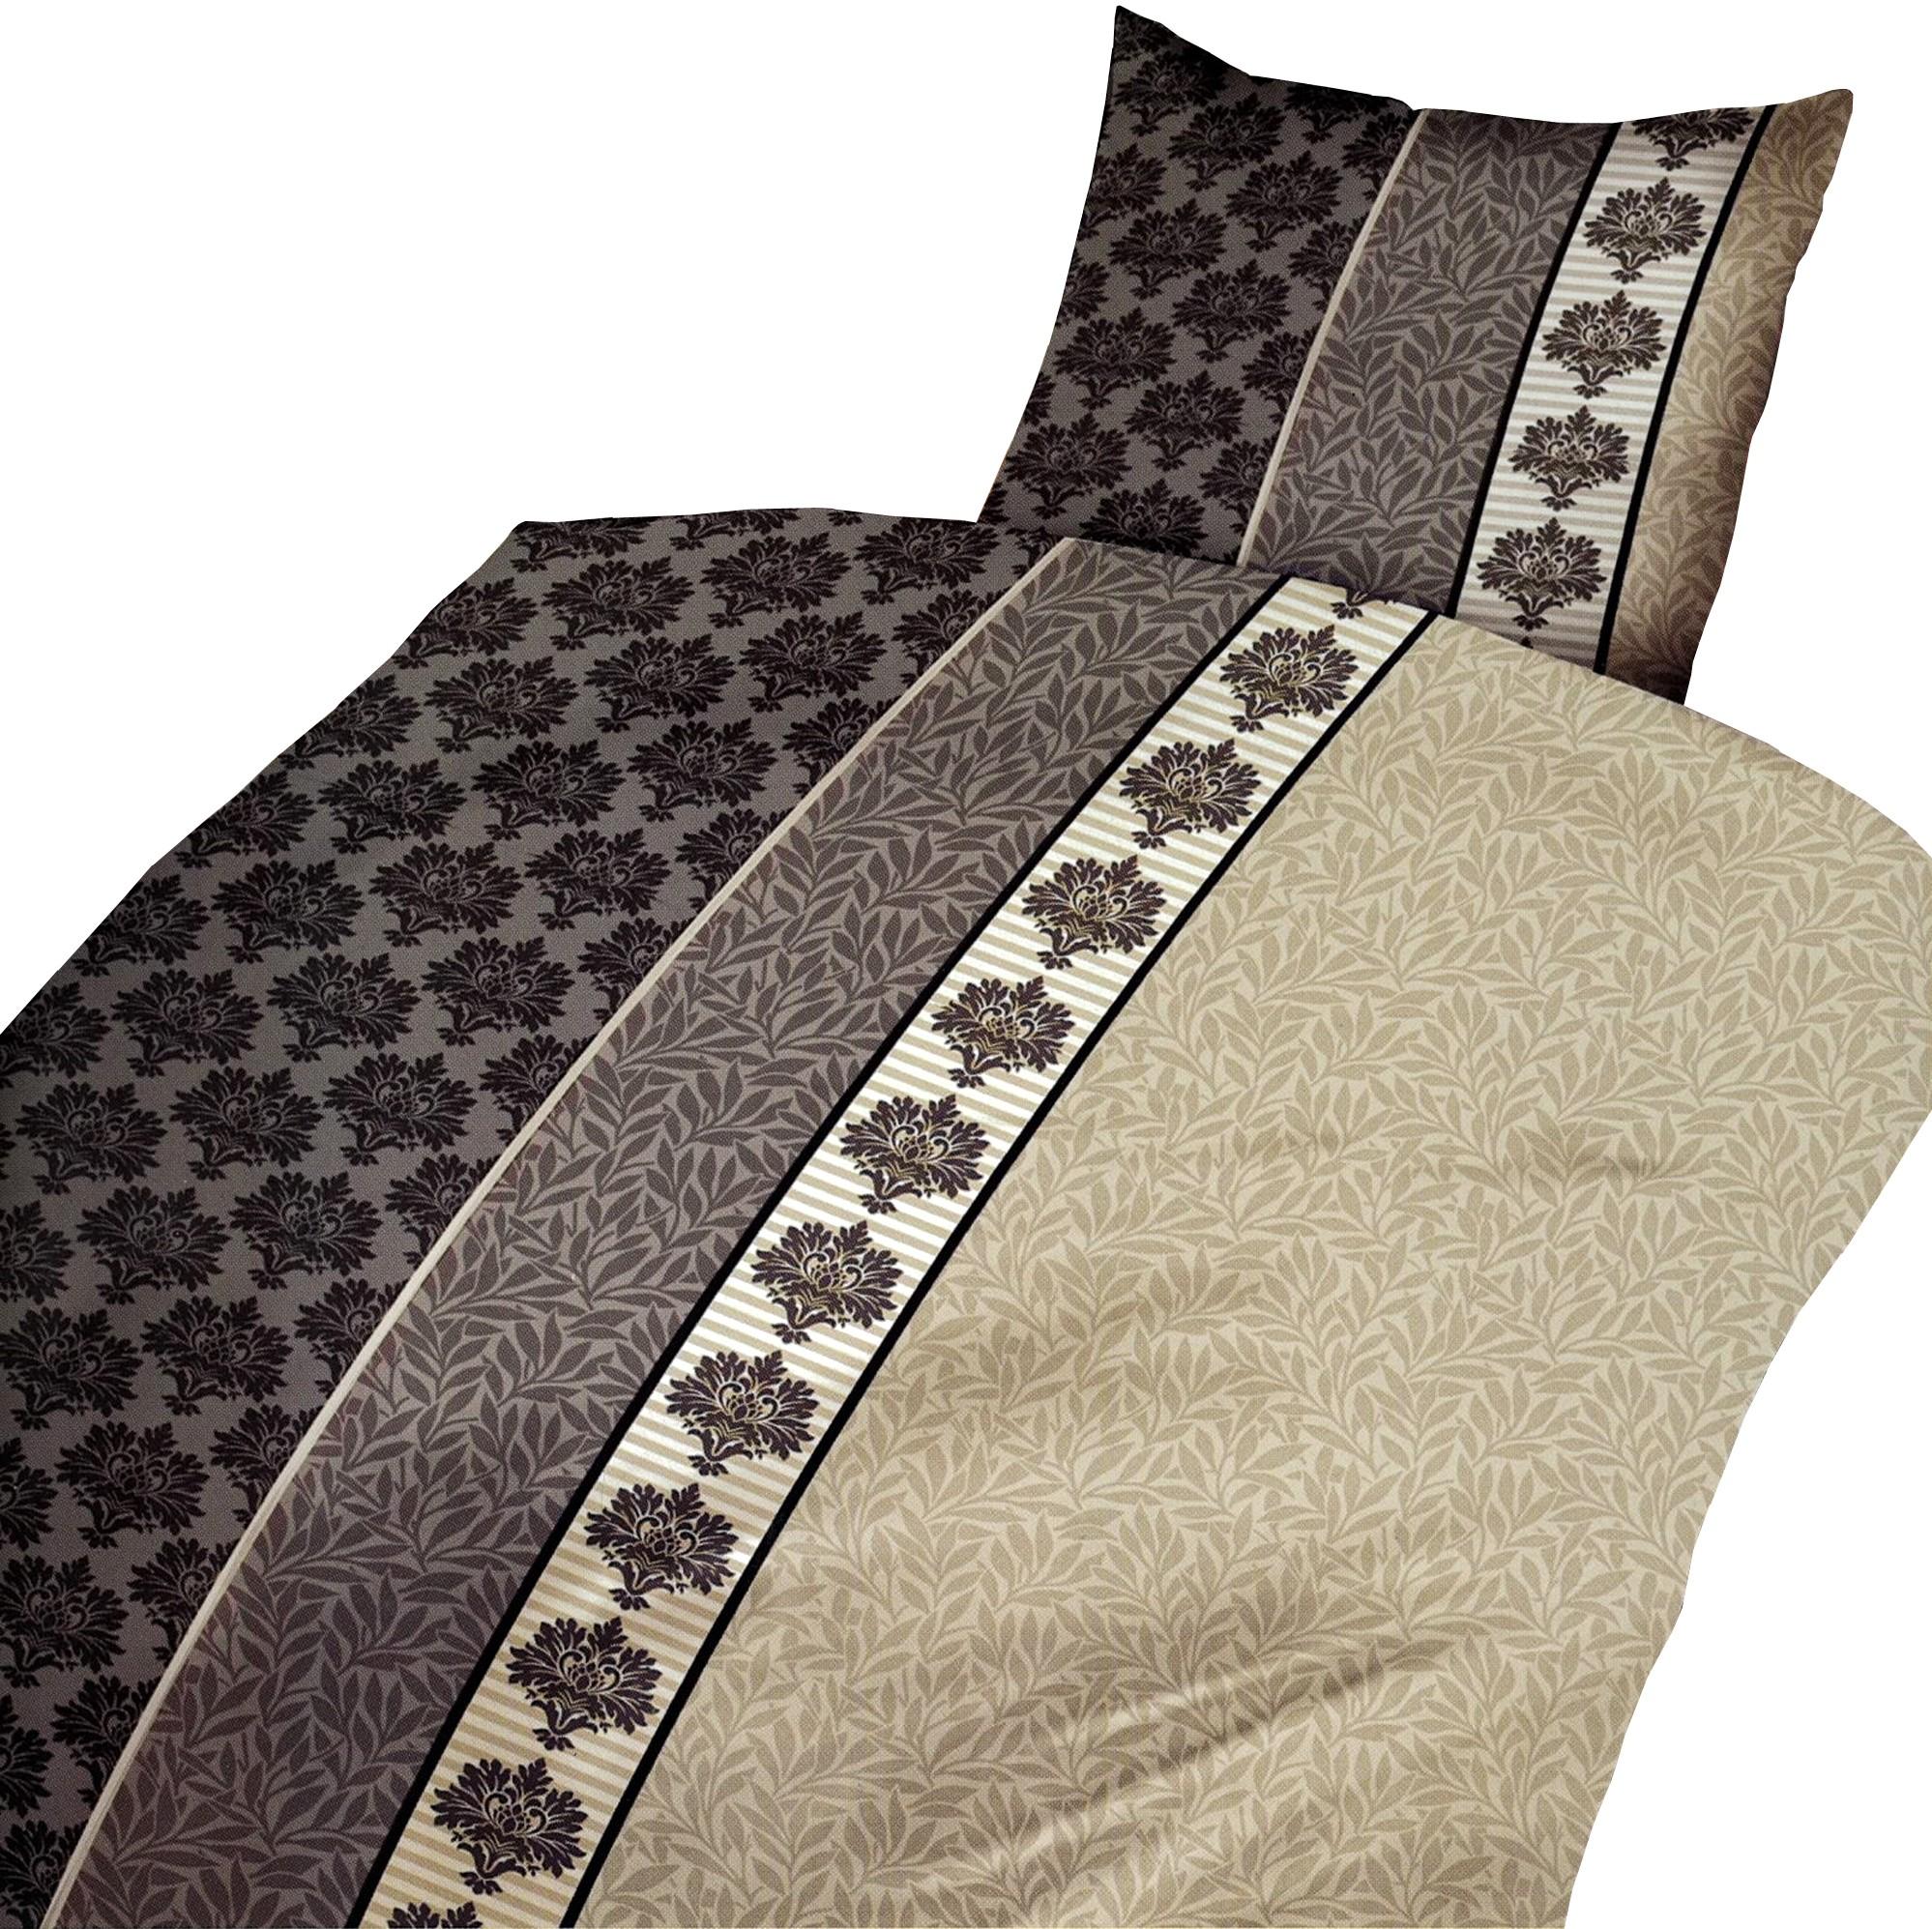 bettwsche jersey 135 x 200 top excellent perfect qvc. Black Bedroom Furniture Sets. Home Design Ideas